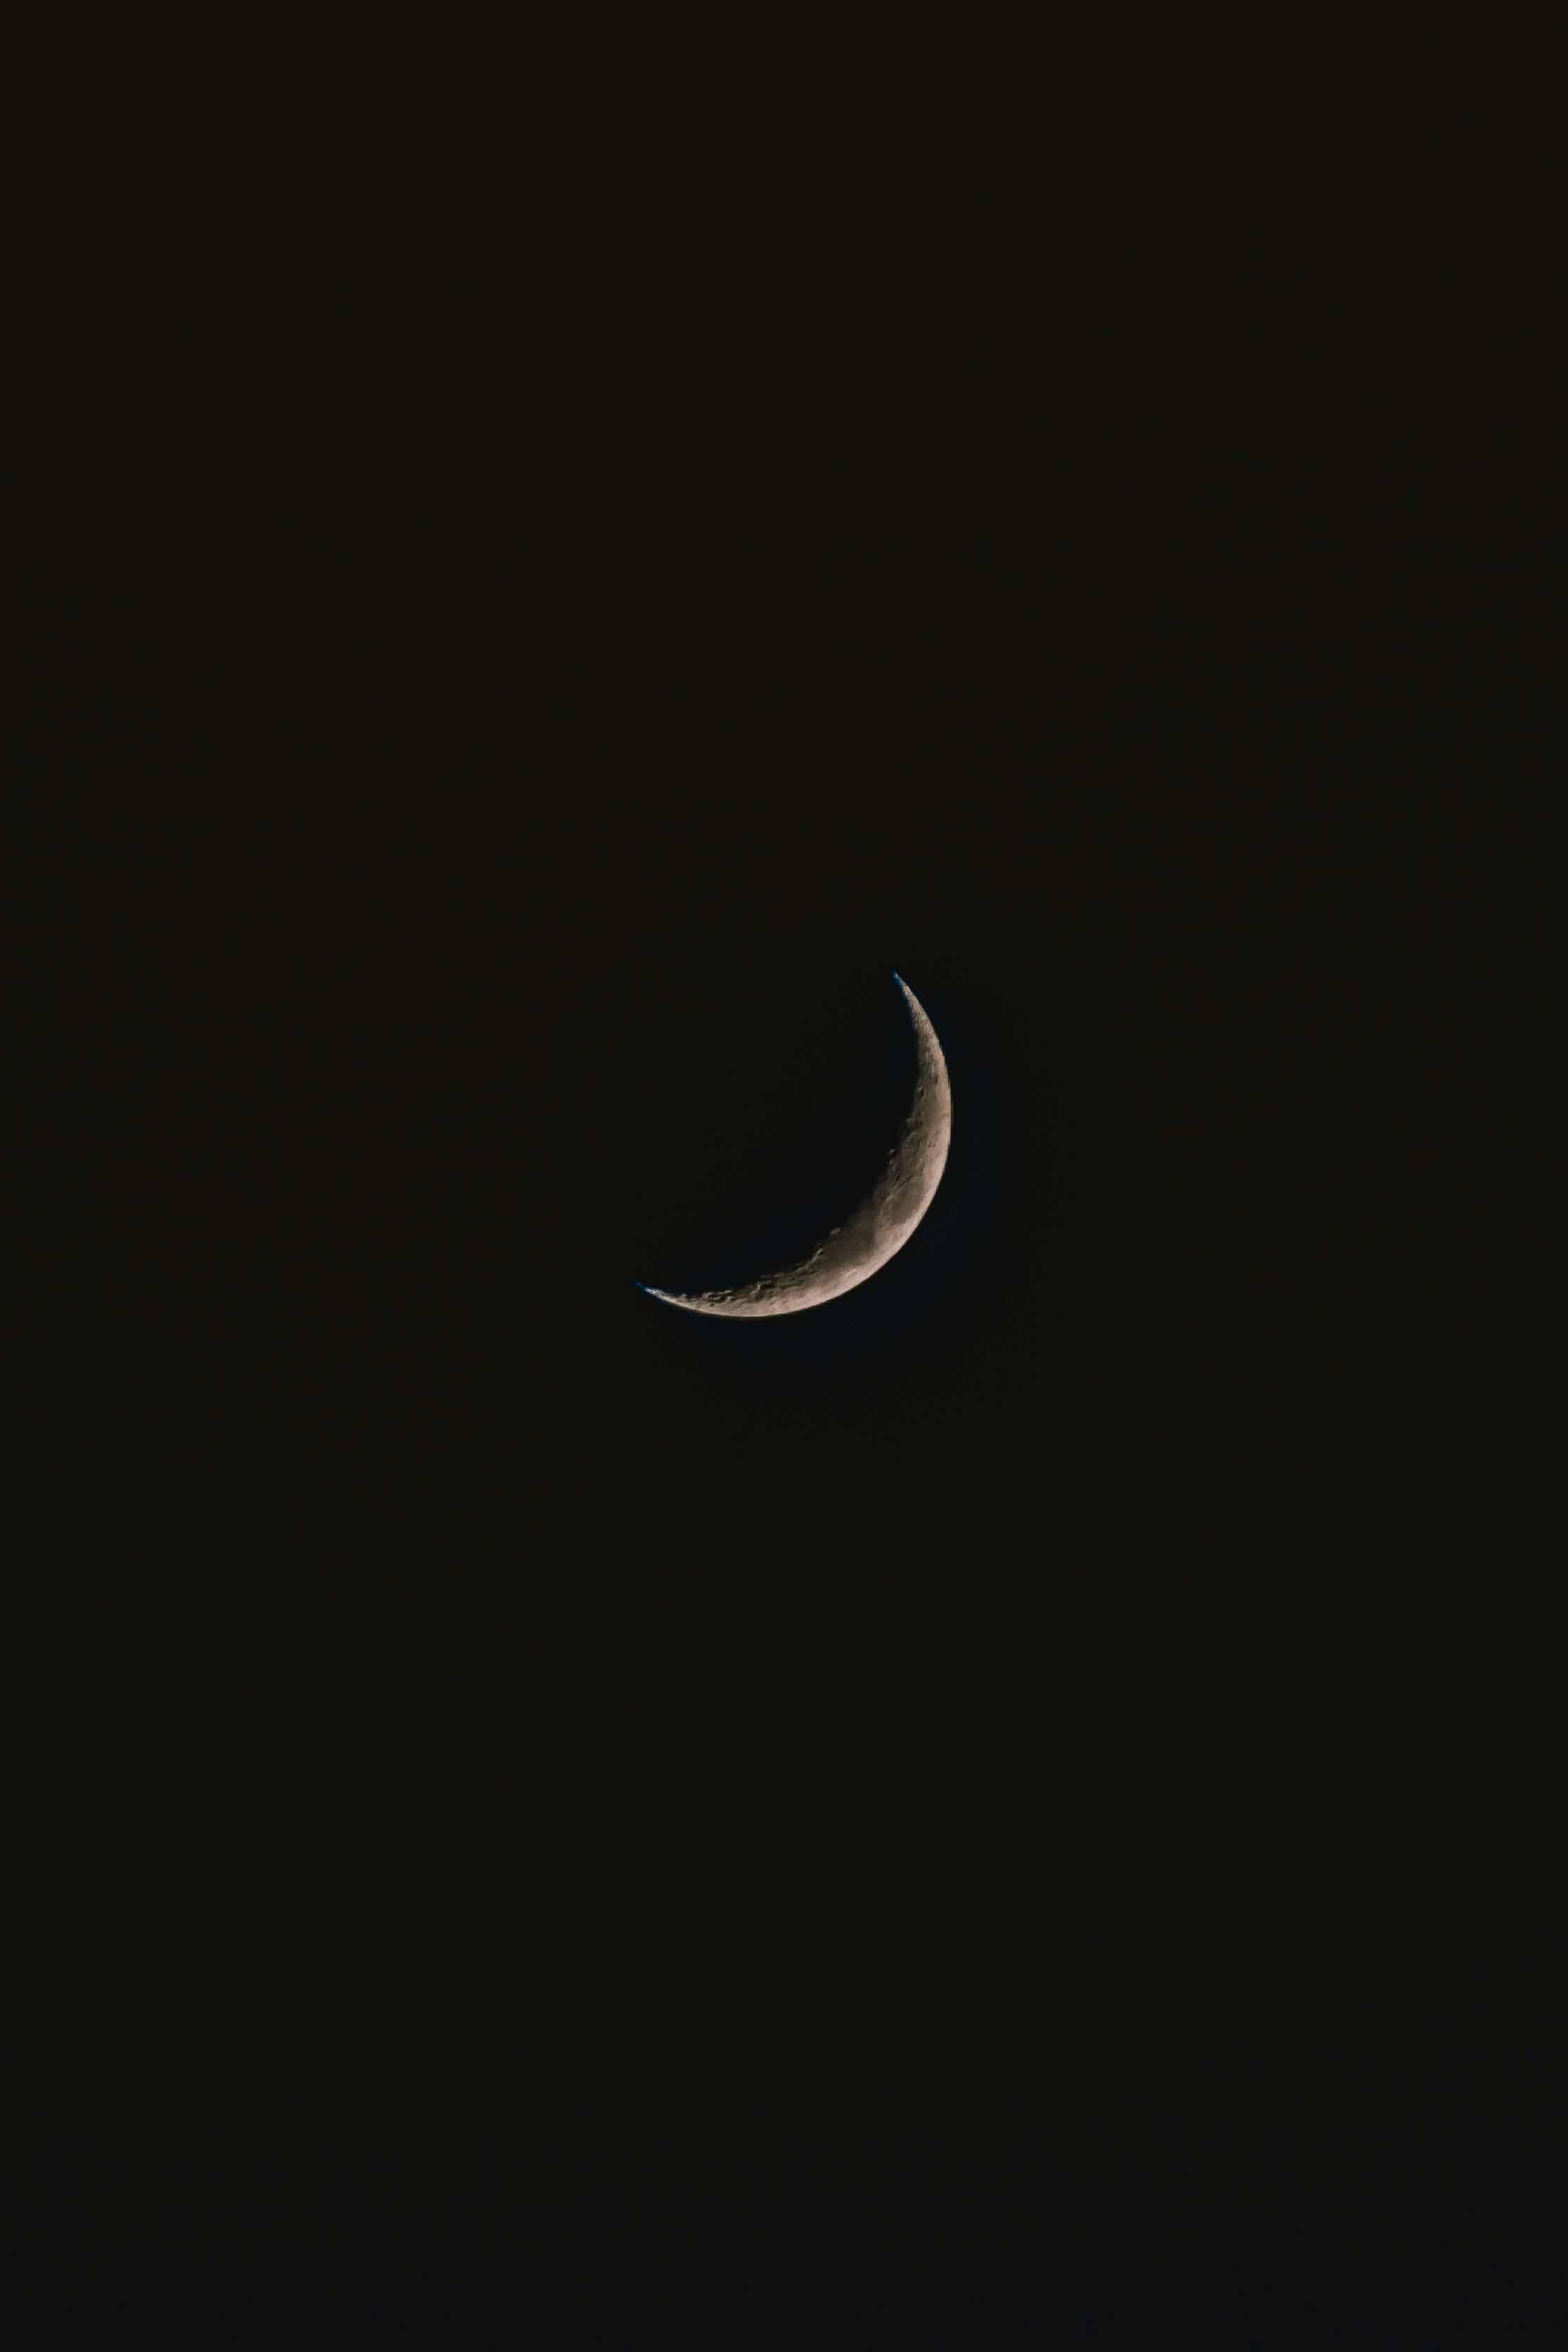 Lune-3-Ophelie-Delmarle-Photographe.jpg